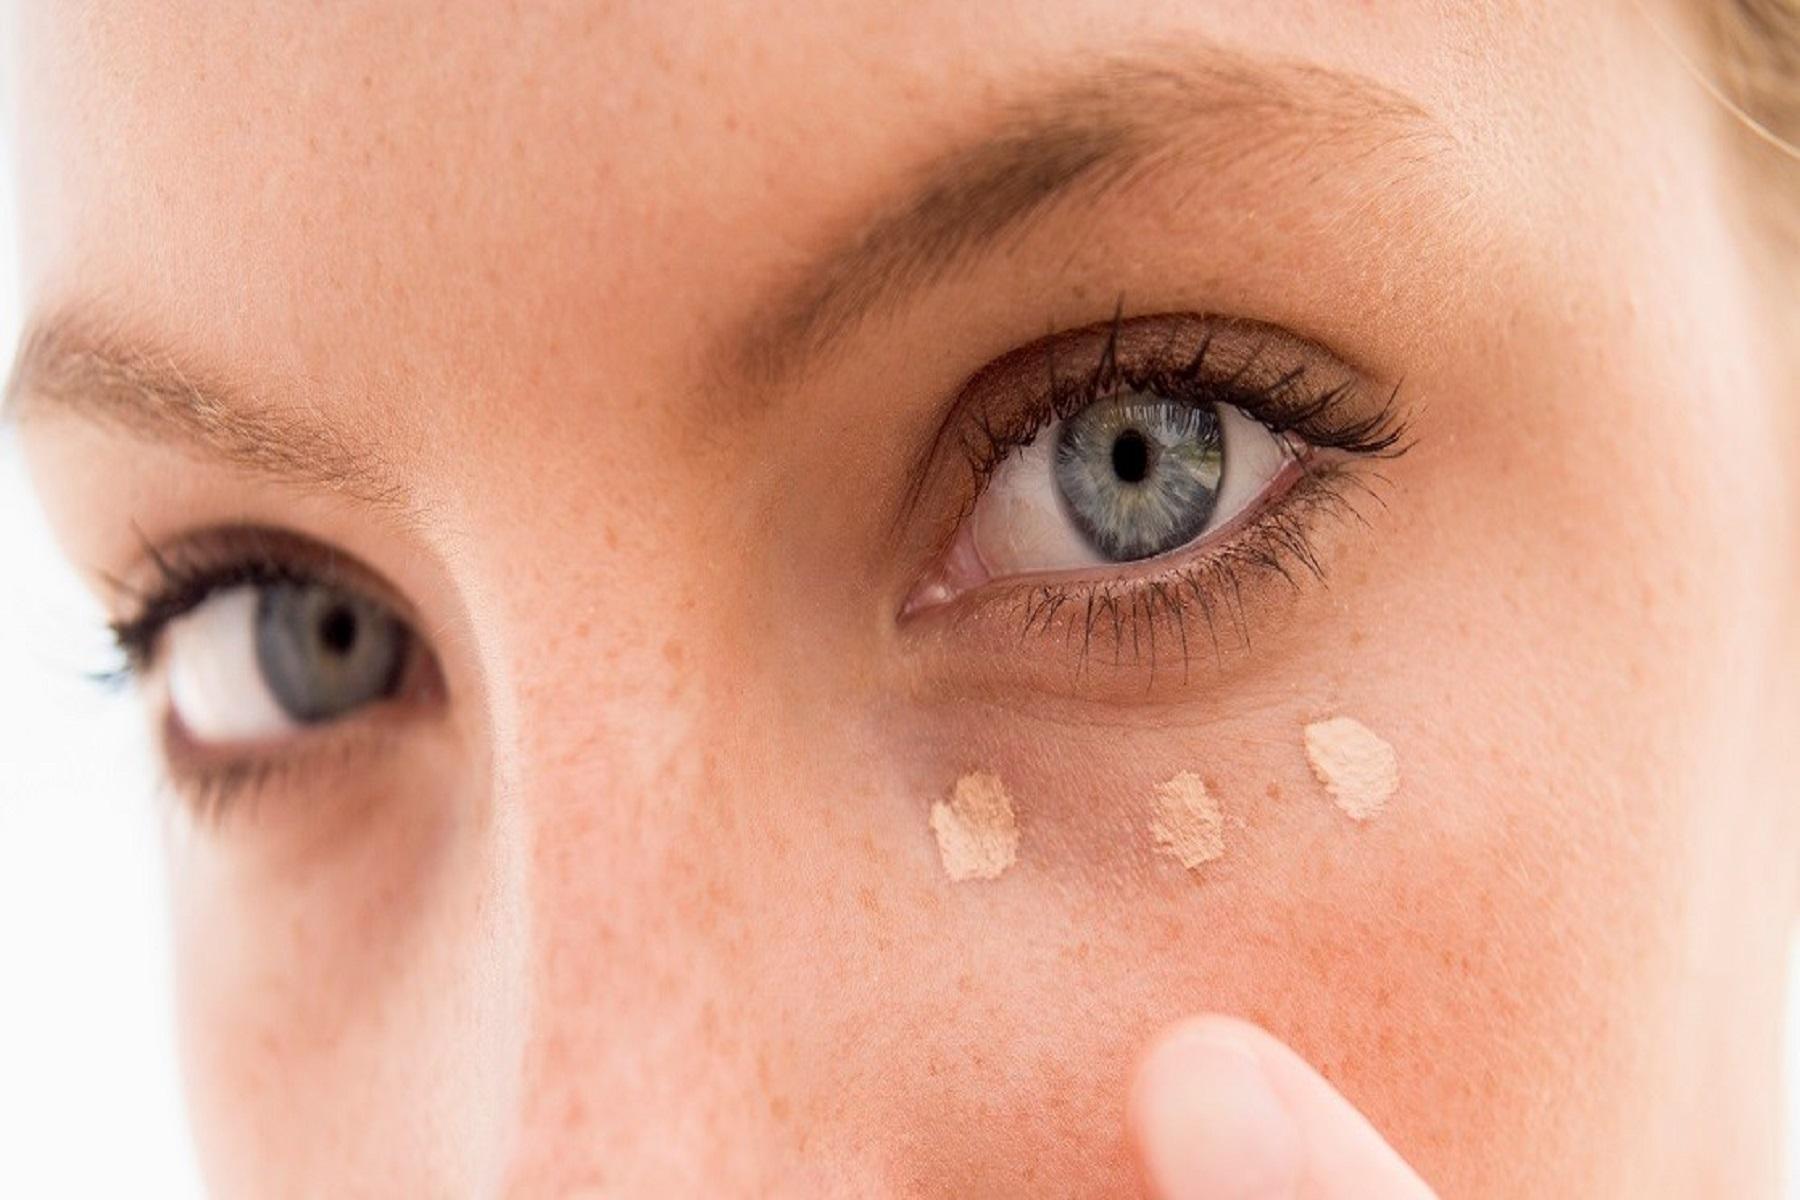 Makeup Συμβουλές: Επιλέξτε με βάση την κάλυψη που θέλετε